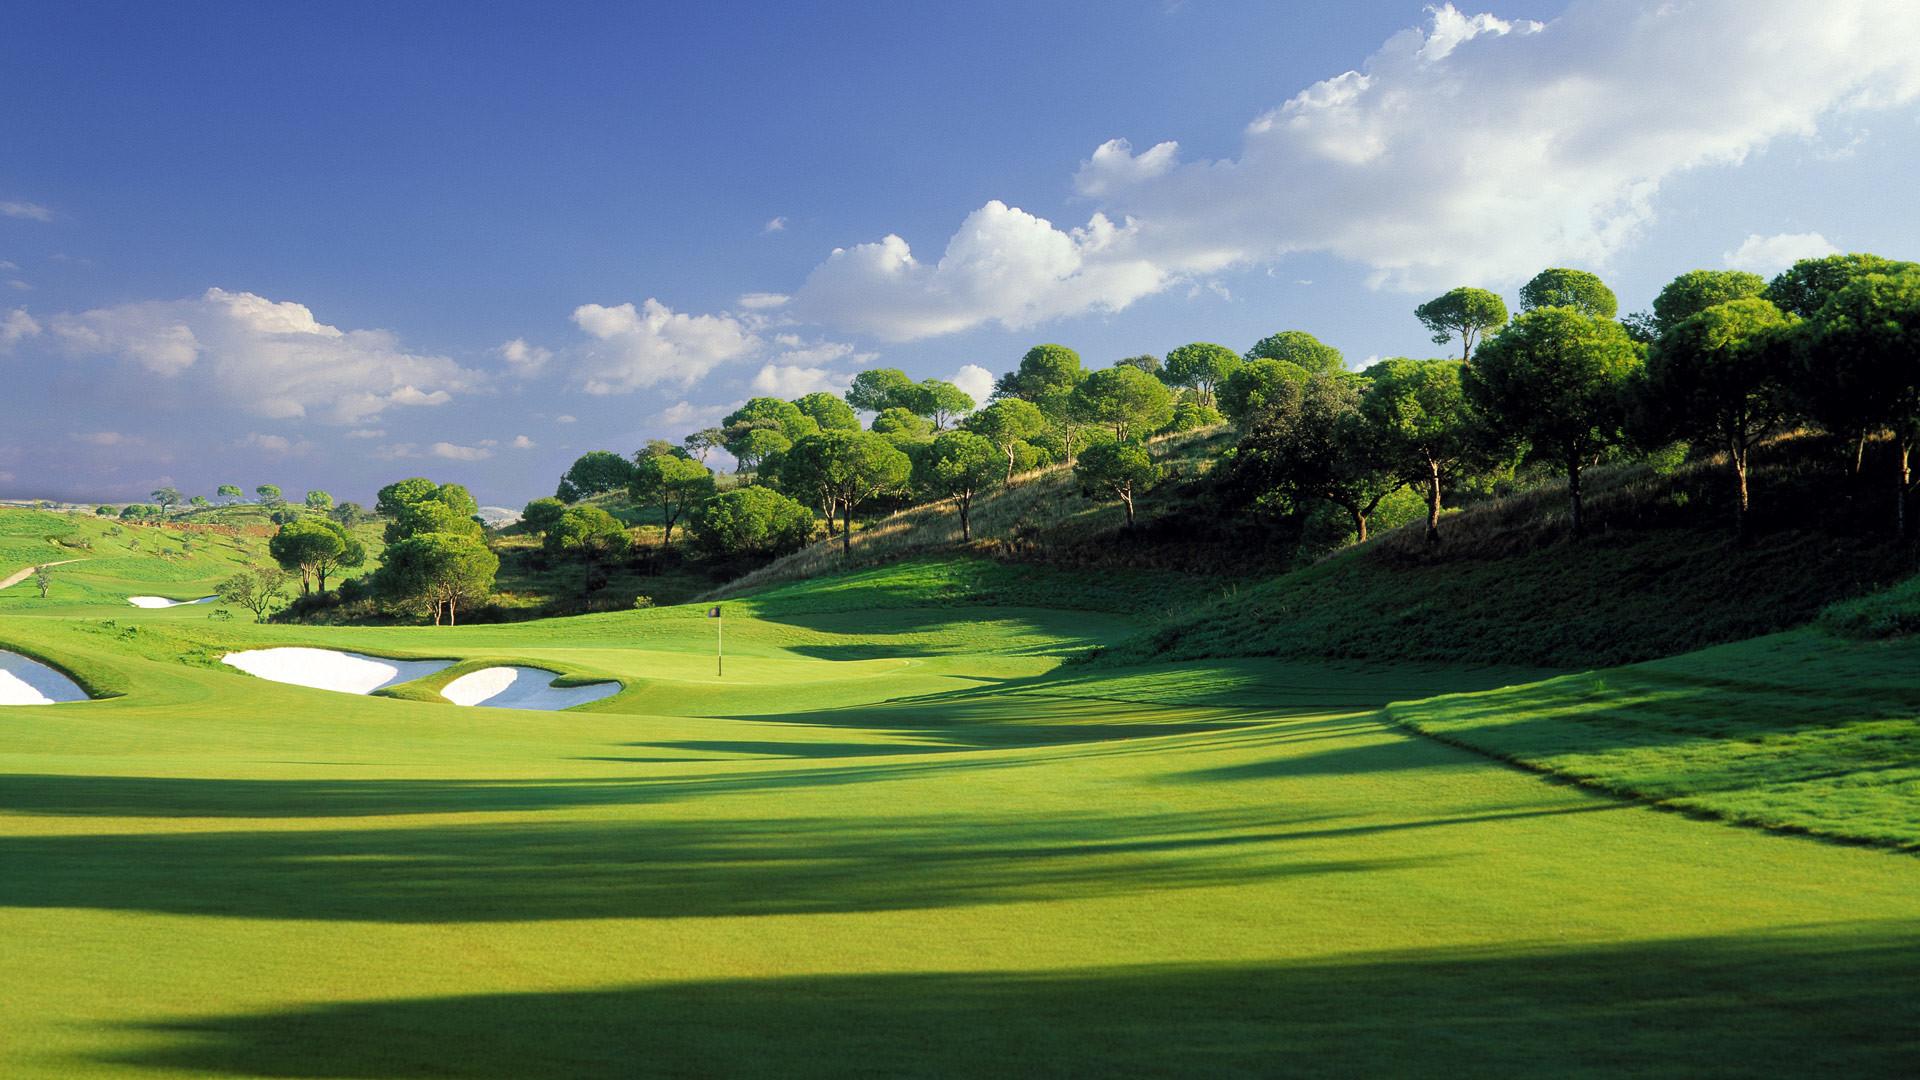 Golf Fields – 1080p HD Wallpaper for Desktop